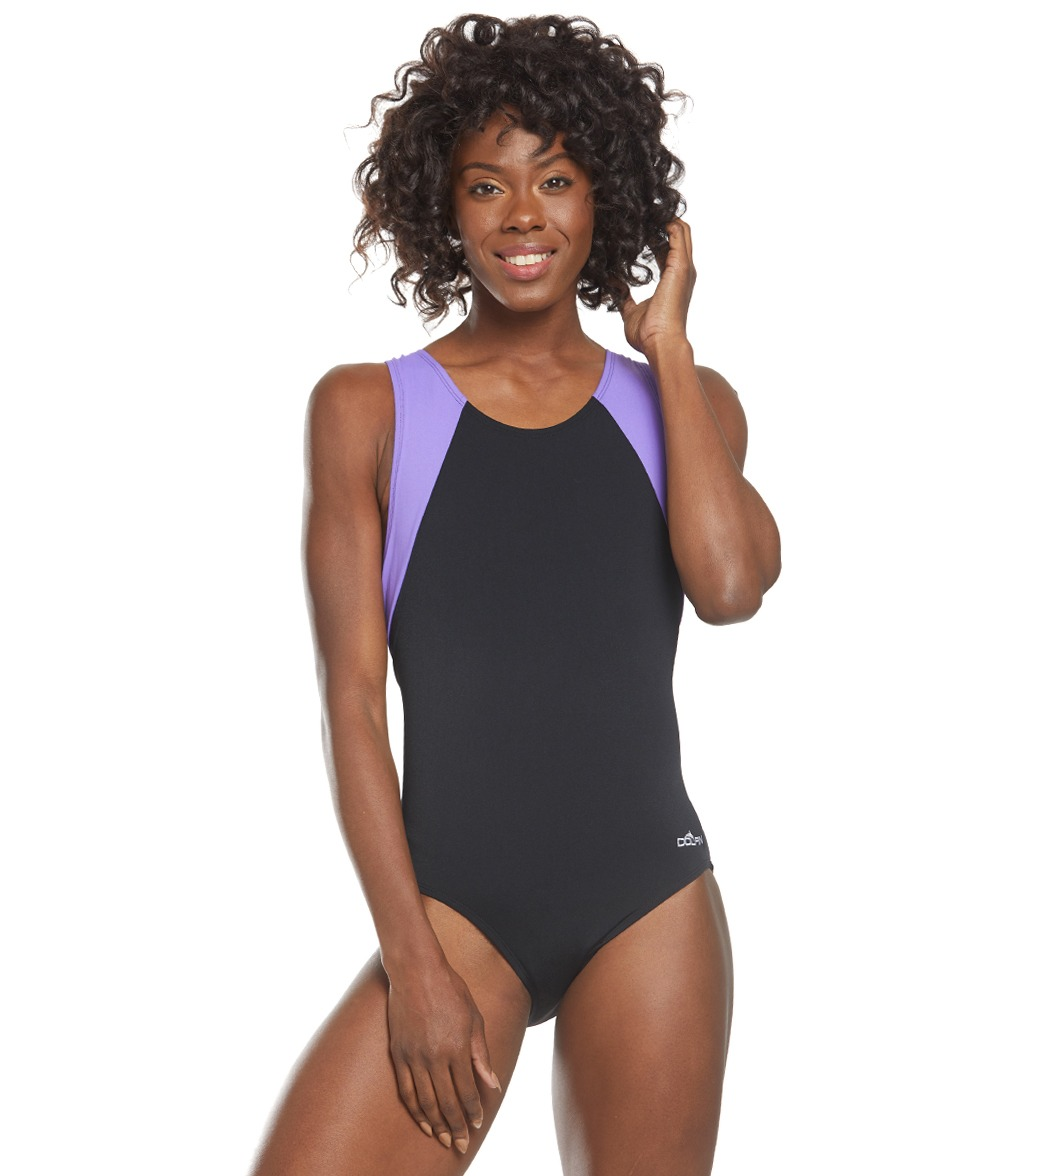 12c78860663 Dolfin Aquashape Moderate Color Block Lap Suit at SwimOutlet.com - Free  Shipping